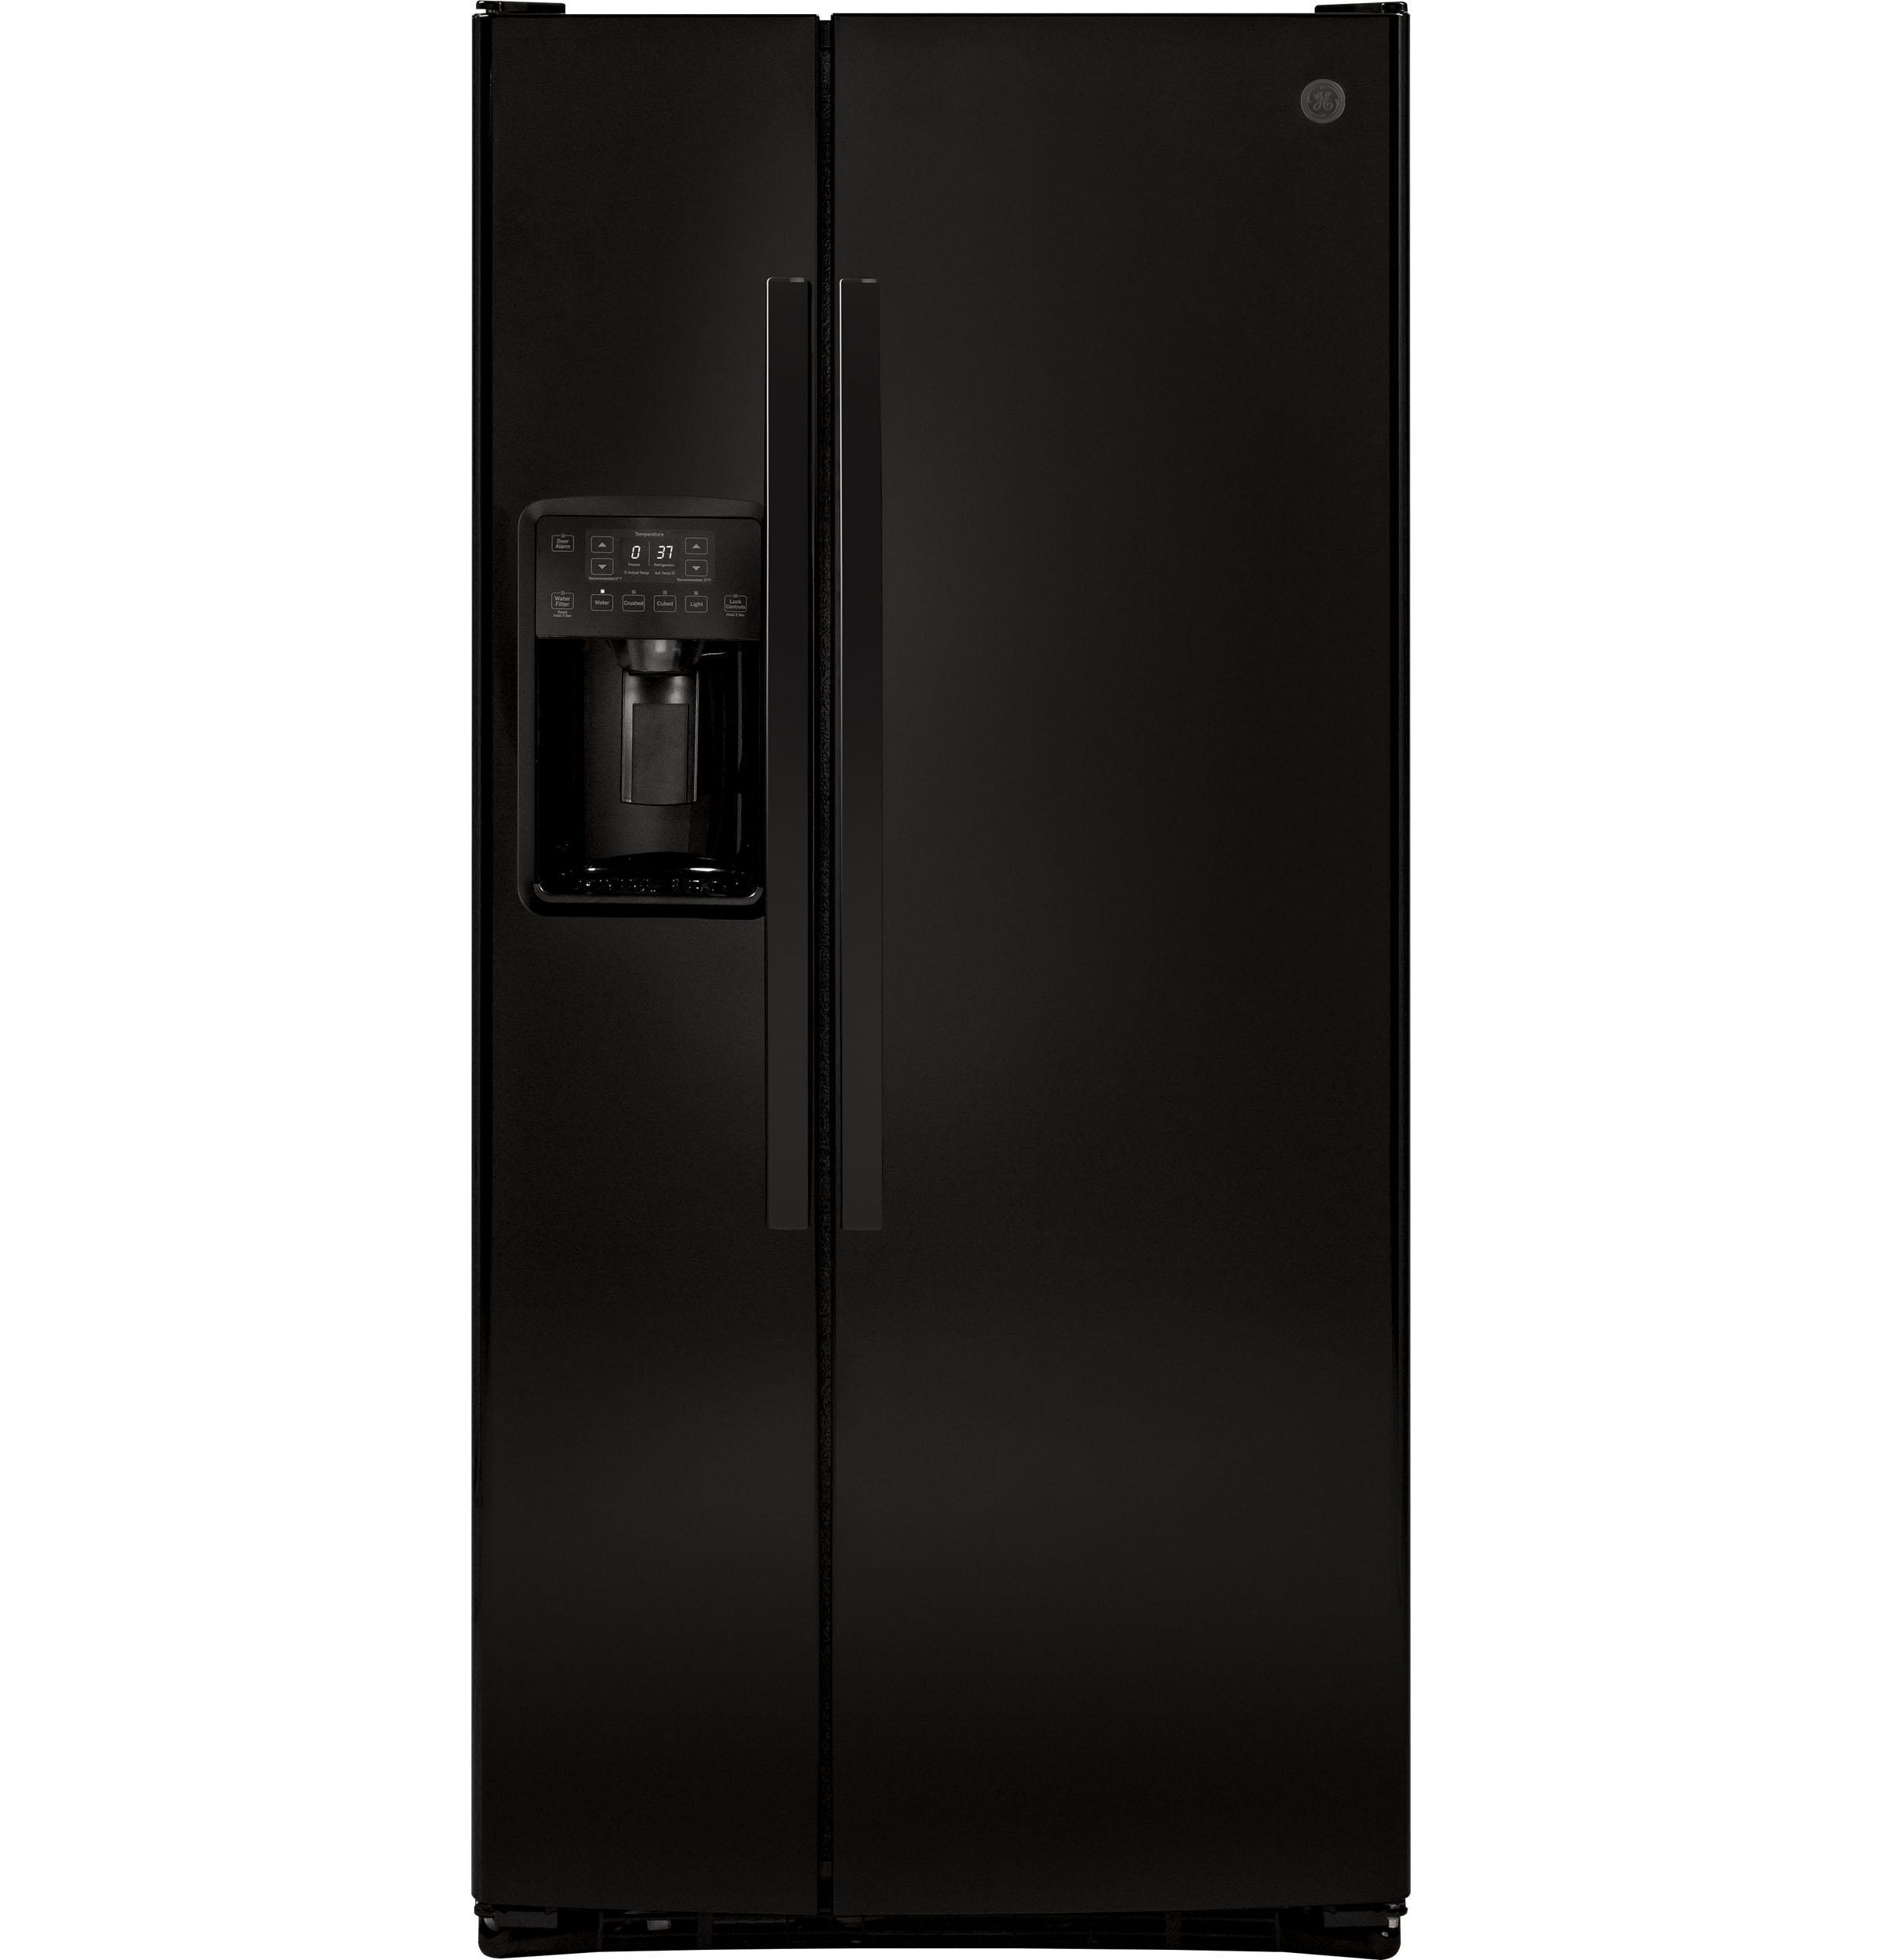 GEEnergy Star® 23.2 Cu. Ft. Side-By-Side Refrigerator